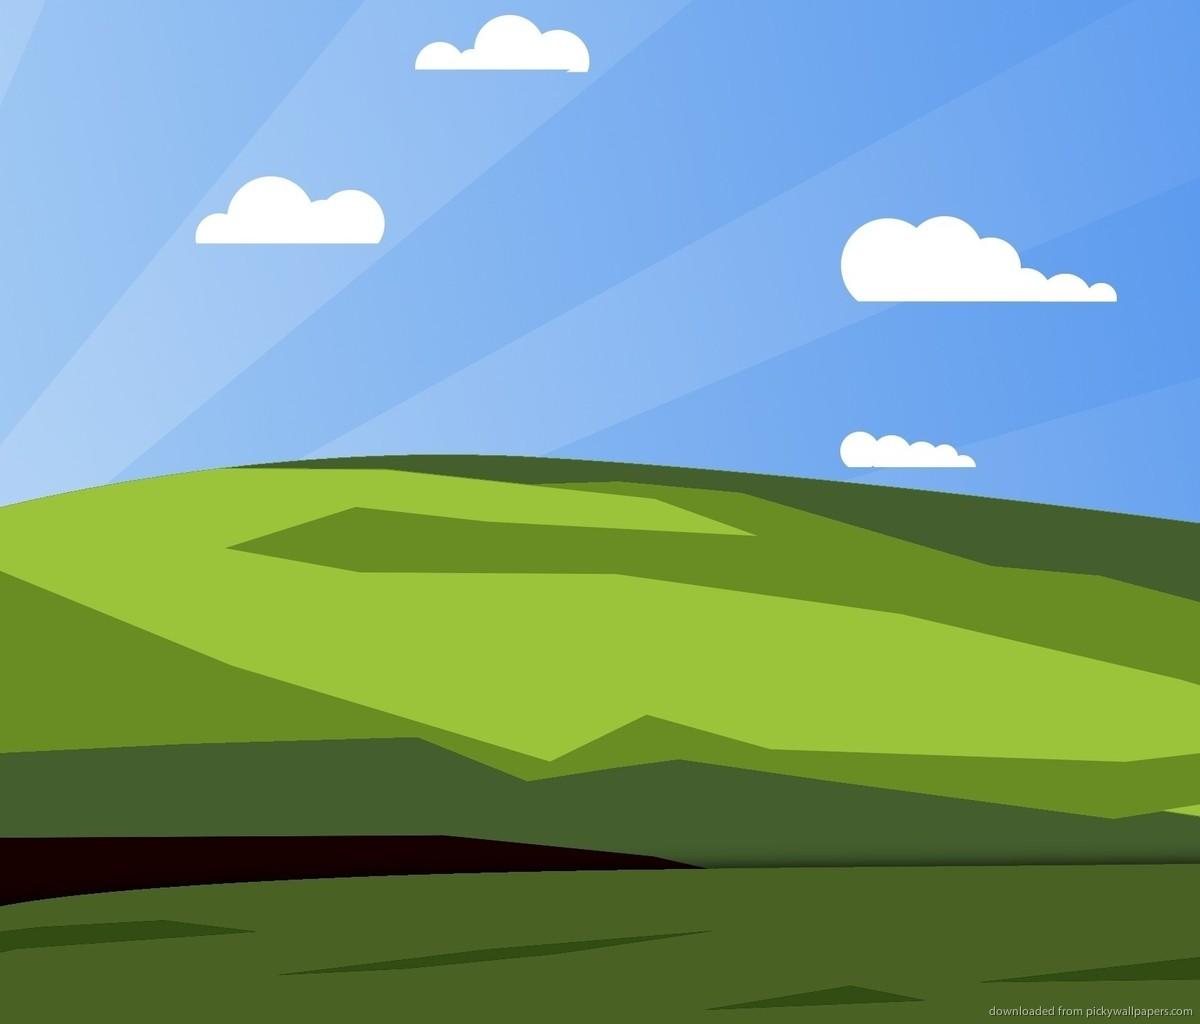 clean stylesimplified classic windows desktop wallpaperdownload 1200x1024